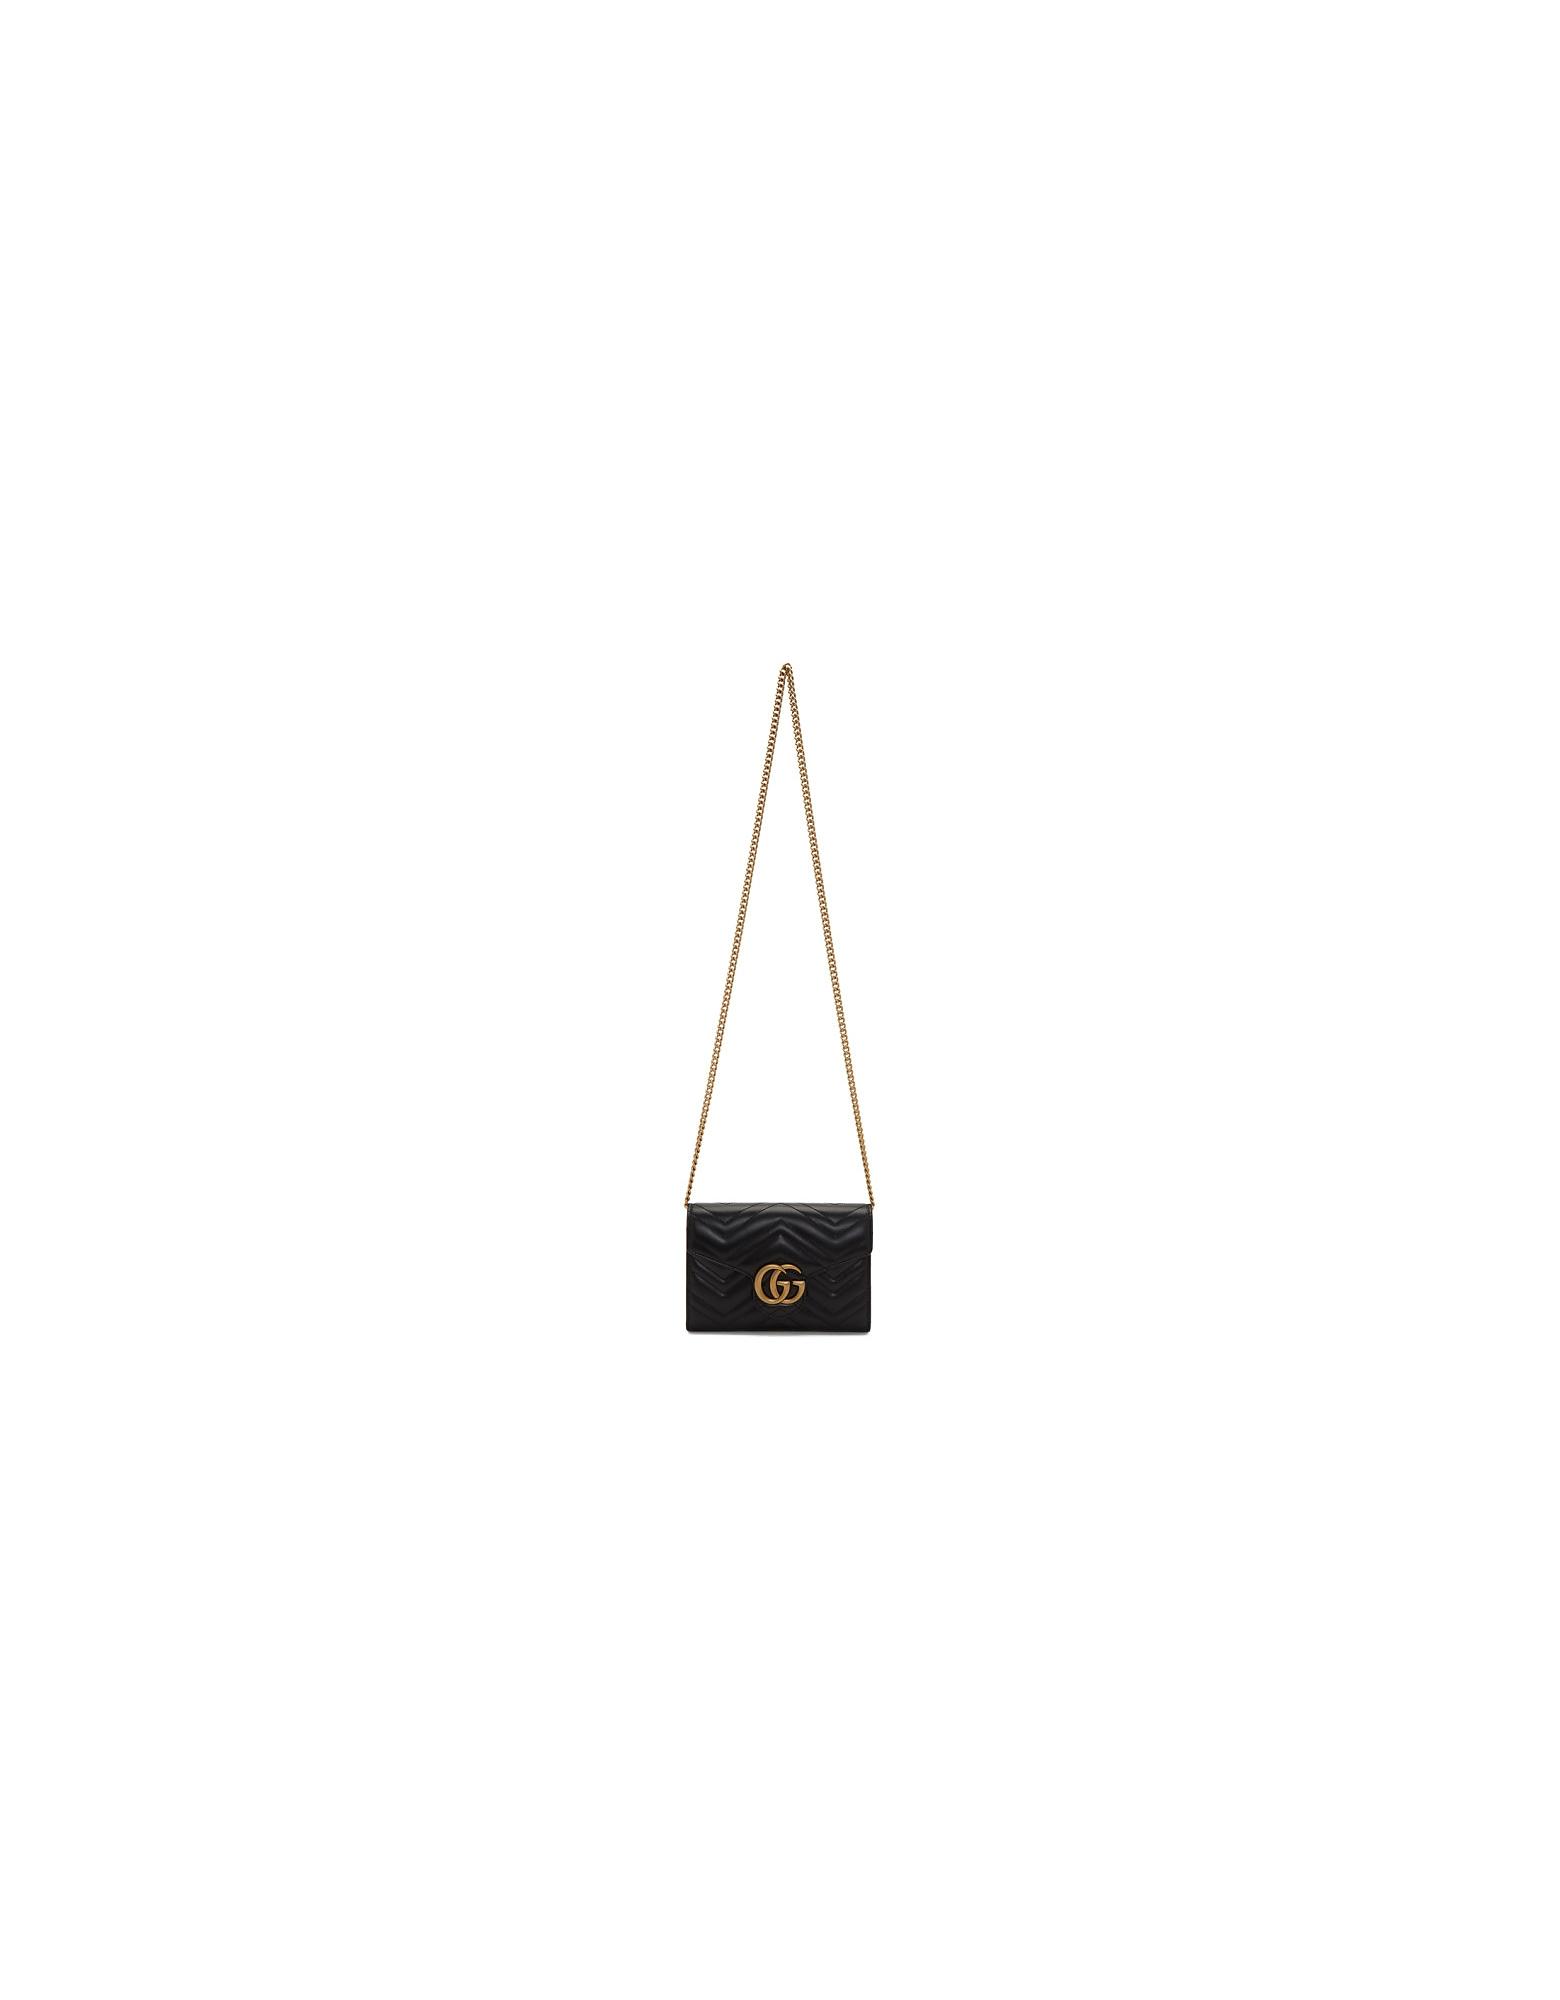 Gucci Designer Handbags, Black Mini GG Marmont Shoulder Bag